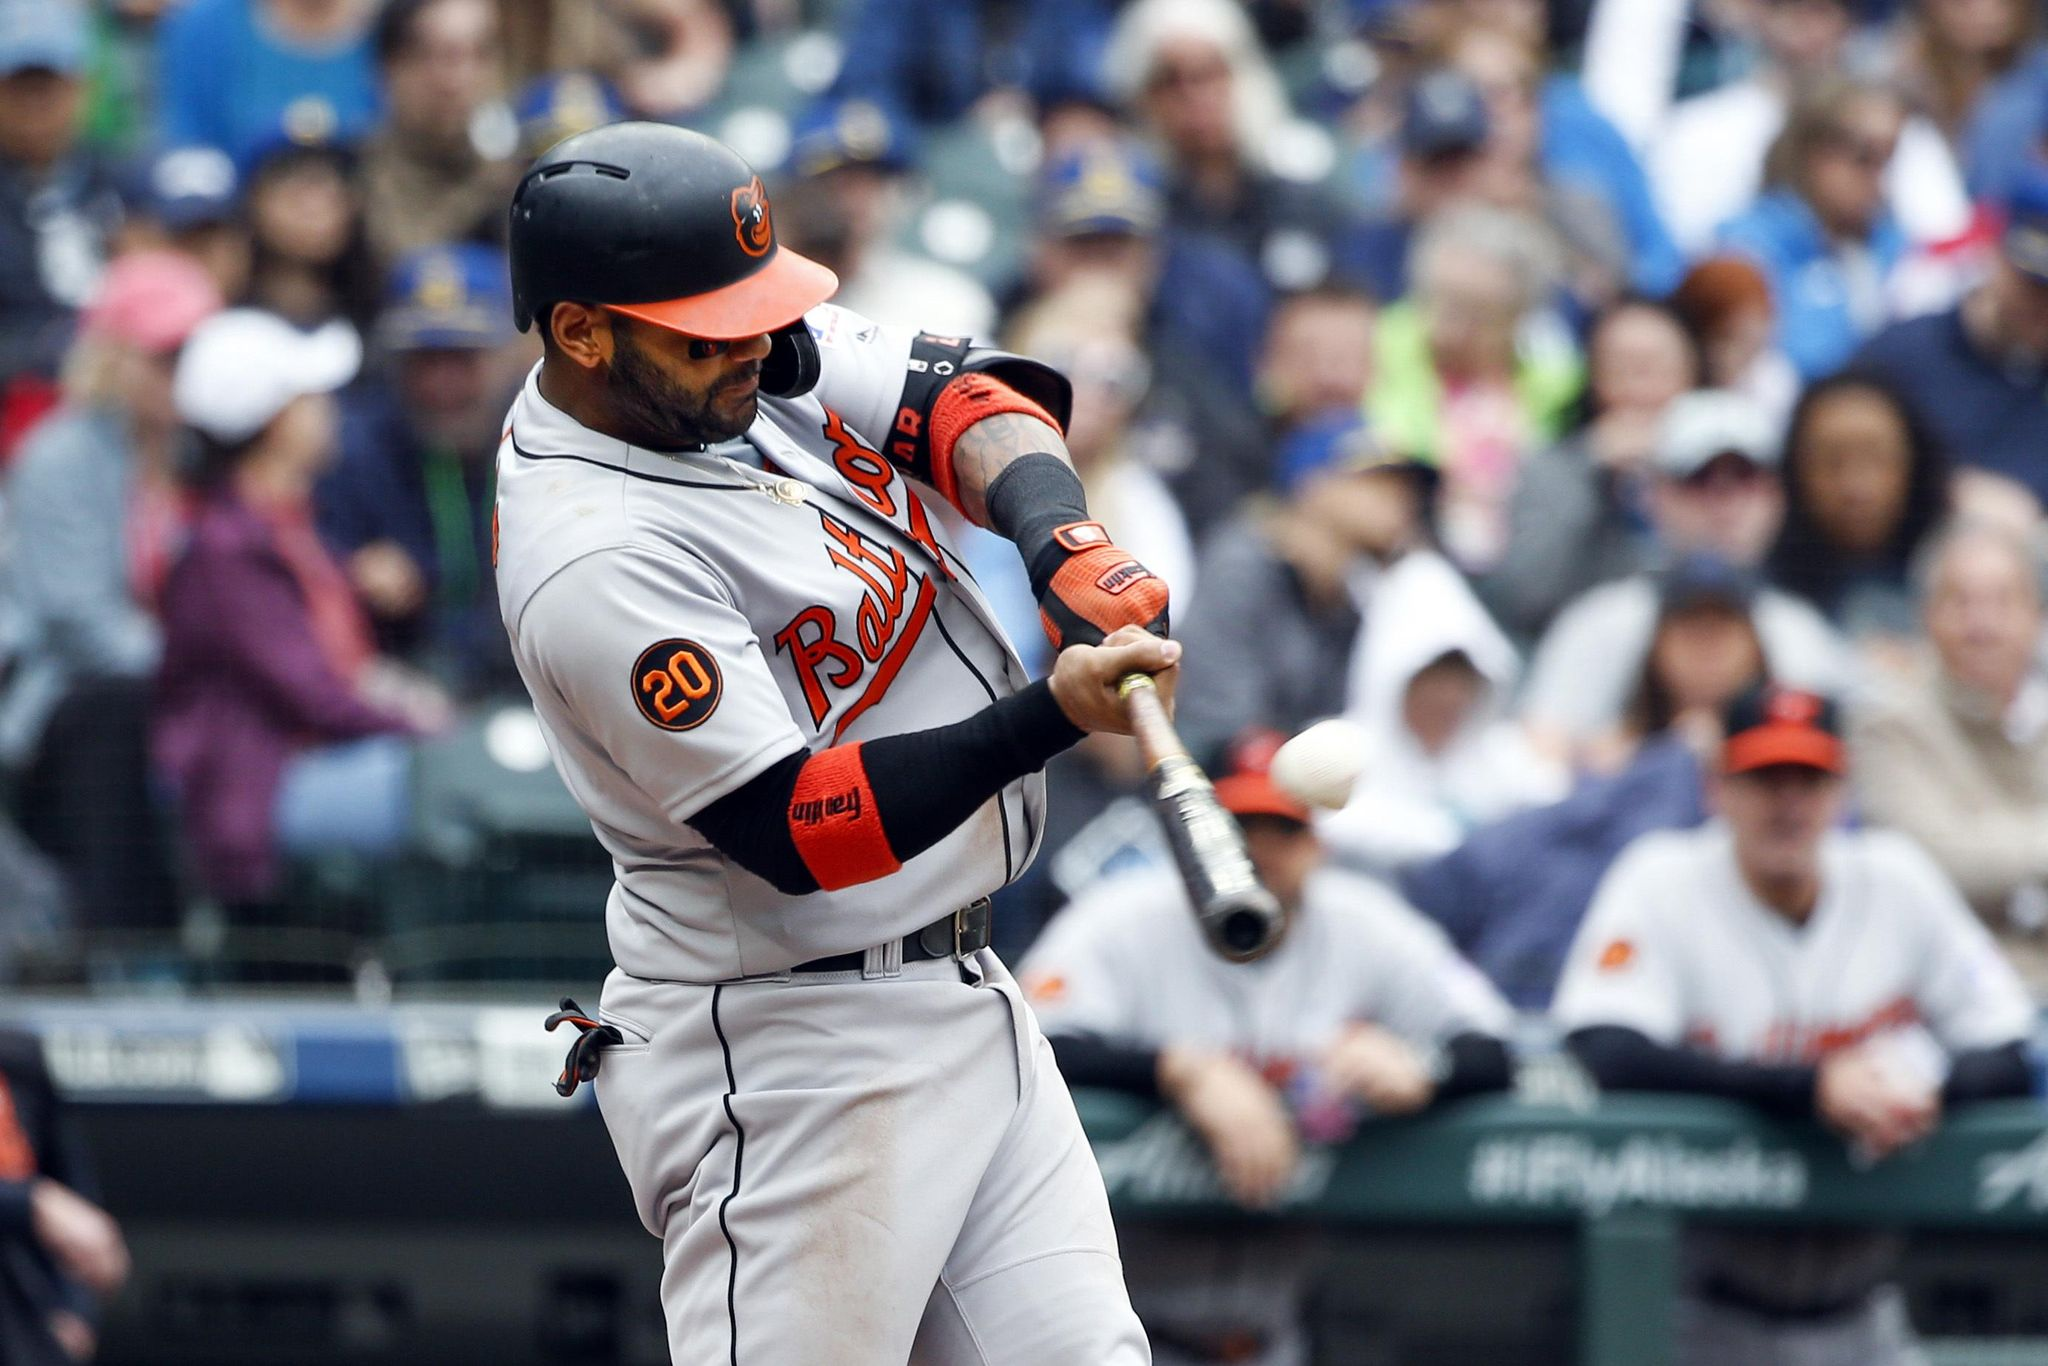 Orioles_mariners_baseball_64864_s2048x1366